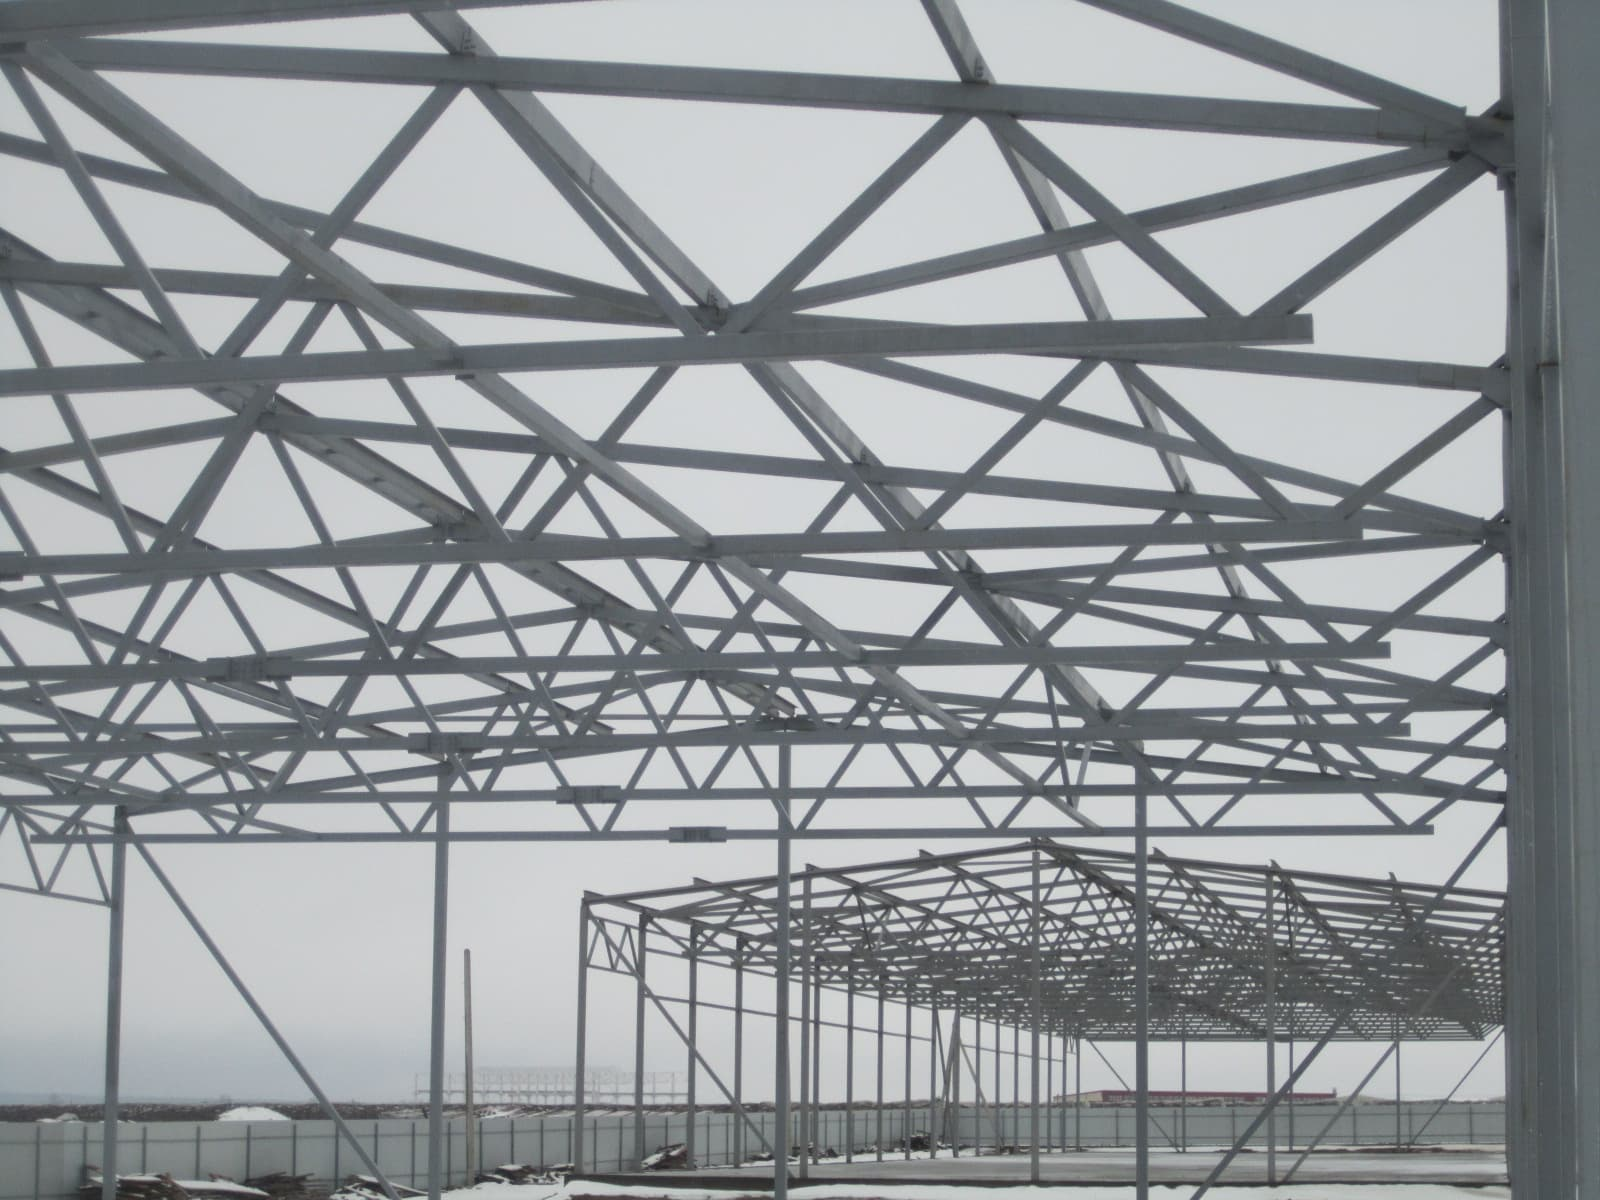 Завод металлоконструкций ЗМК «Северо-Запад»